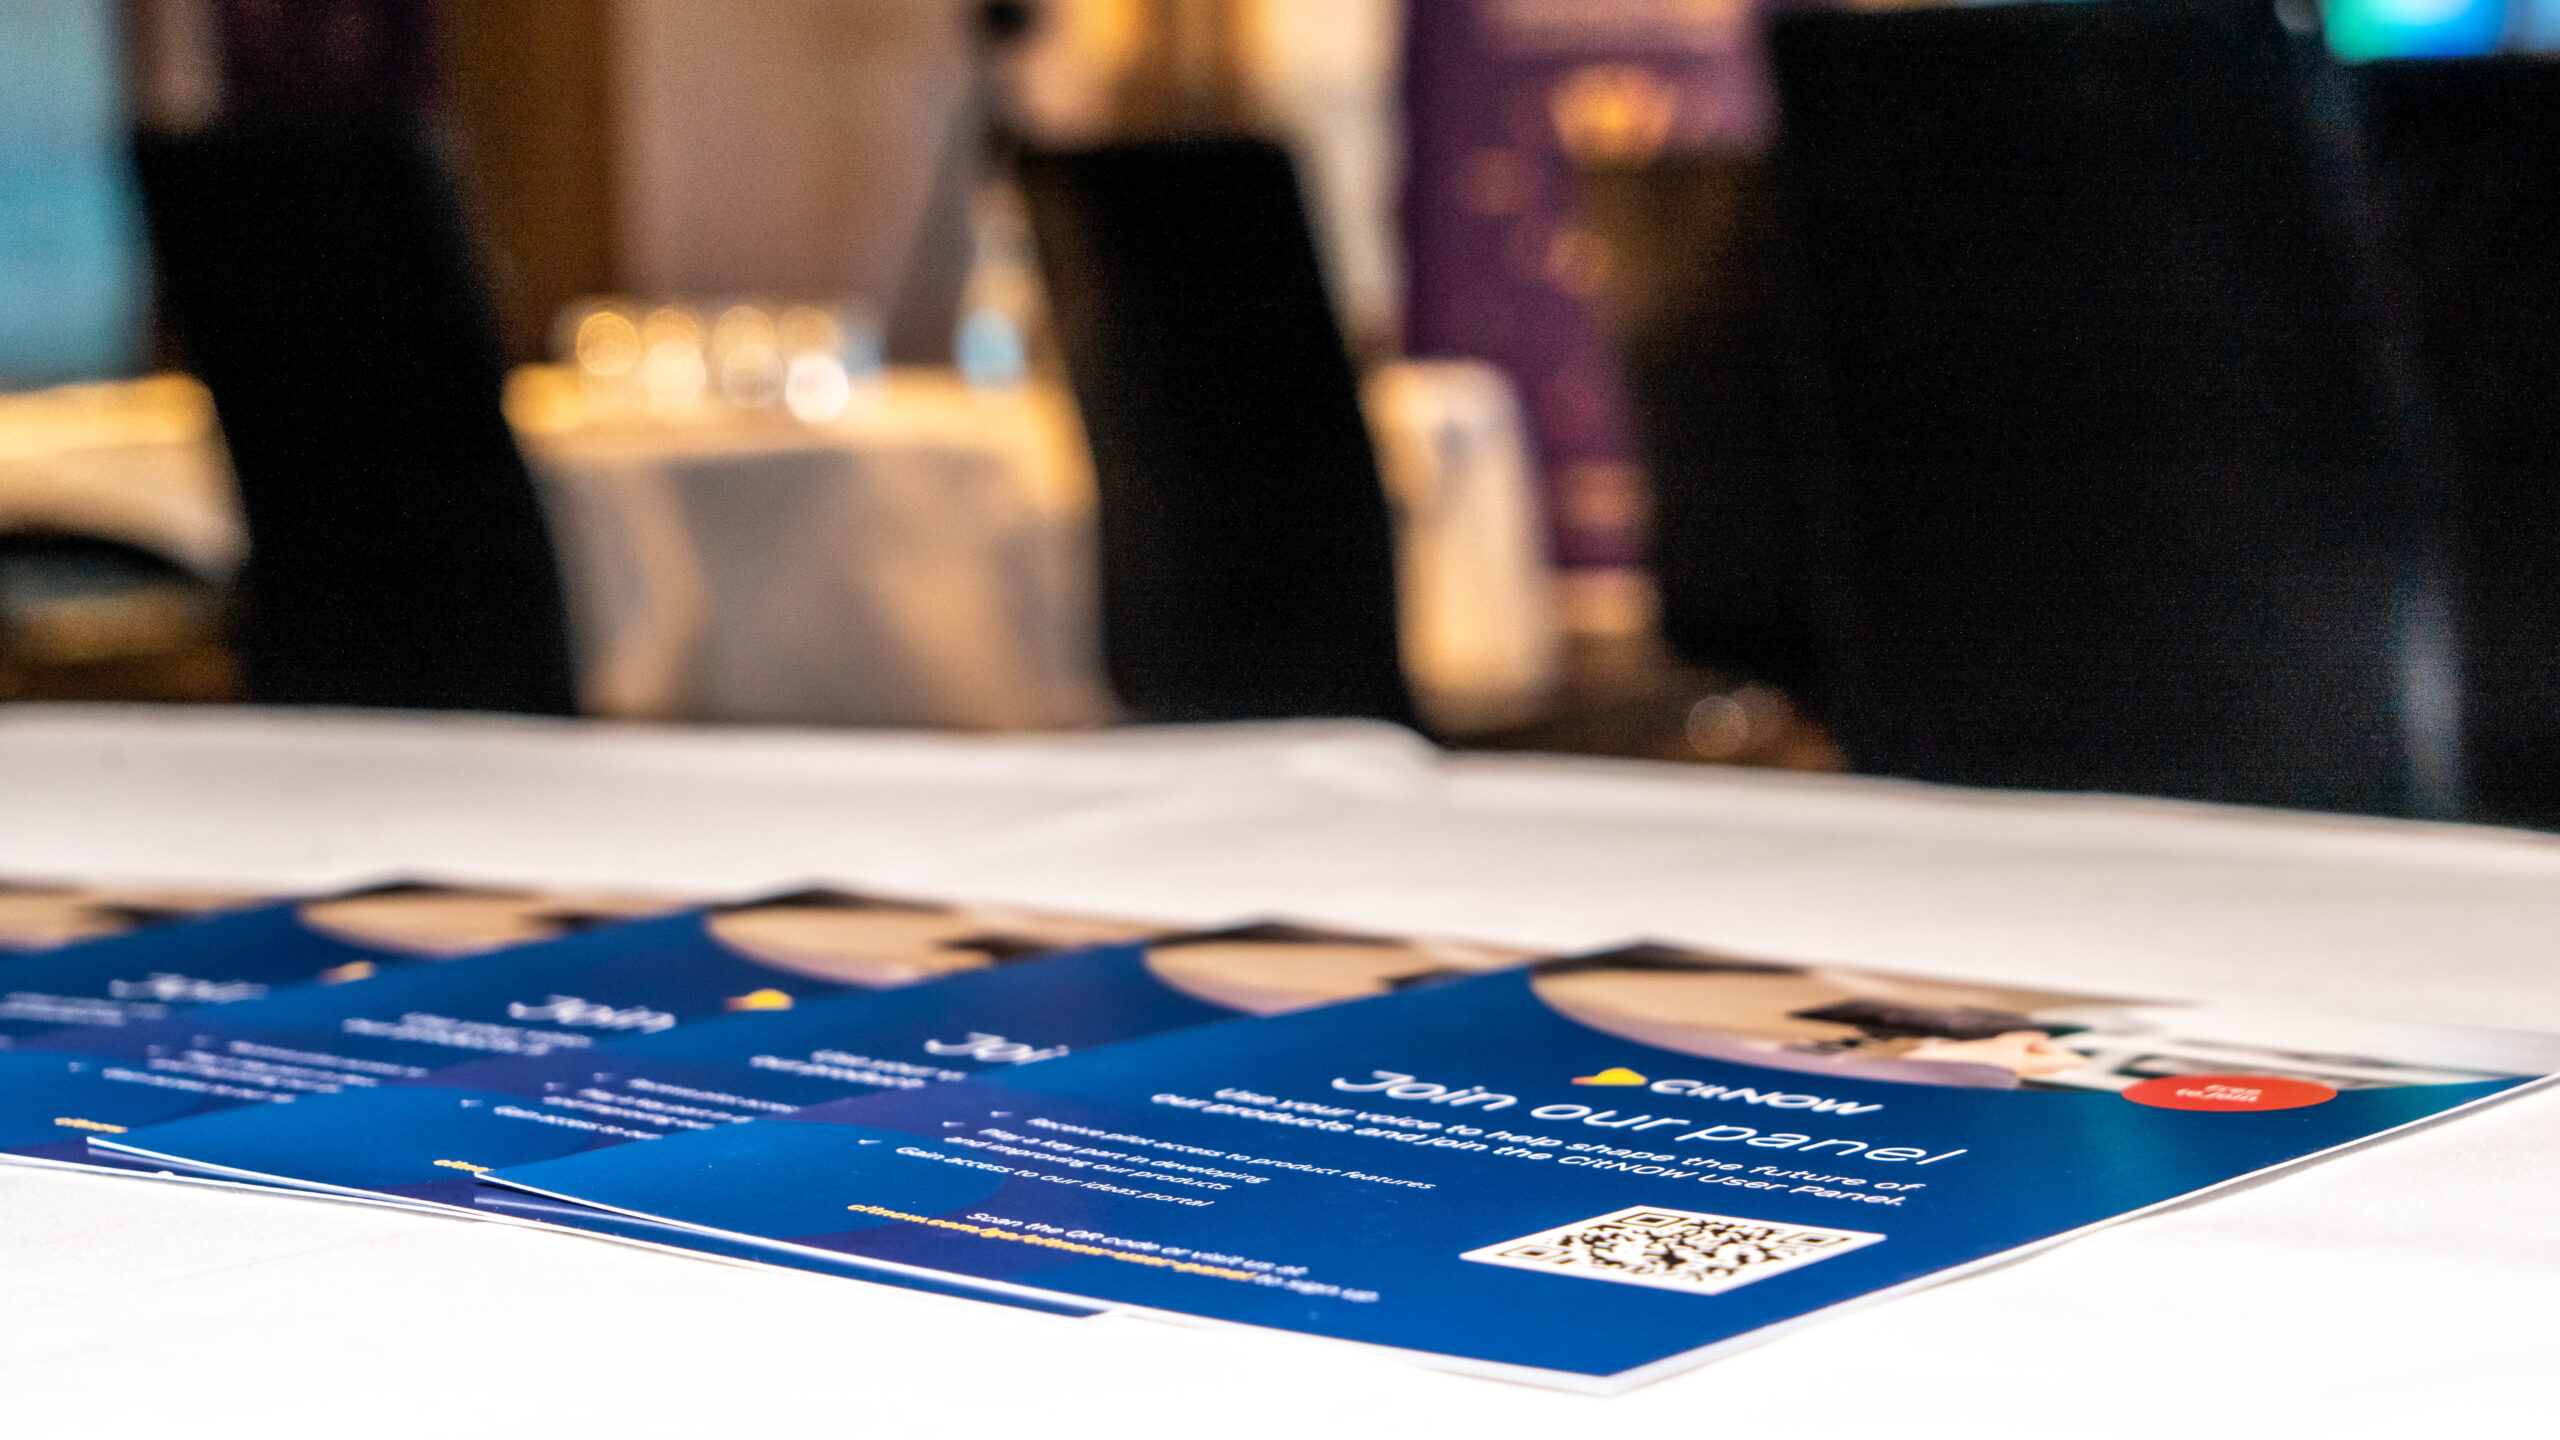 CitNOW flyers on a table